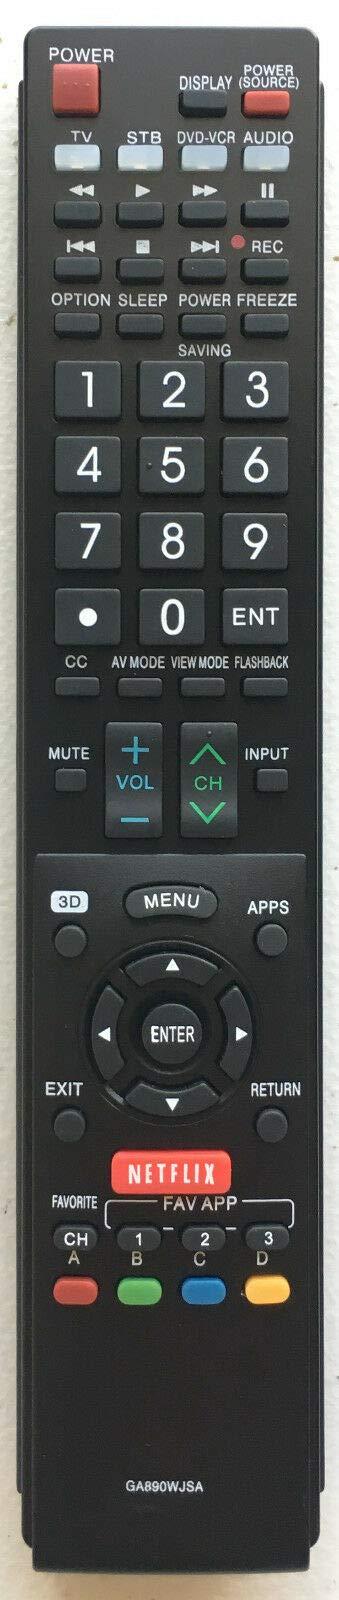 USBRMT GB005WJSA - Mando a Distancia de Repuesto para televisor Sharp AQUOS GB004WJSA GB118WJSA GA935WJSA GA890WJSA GB105WJSA: Amazon.es: Electrónica